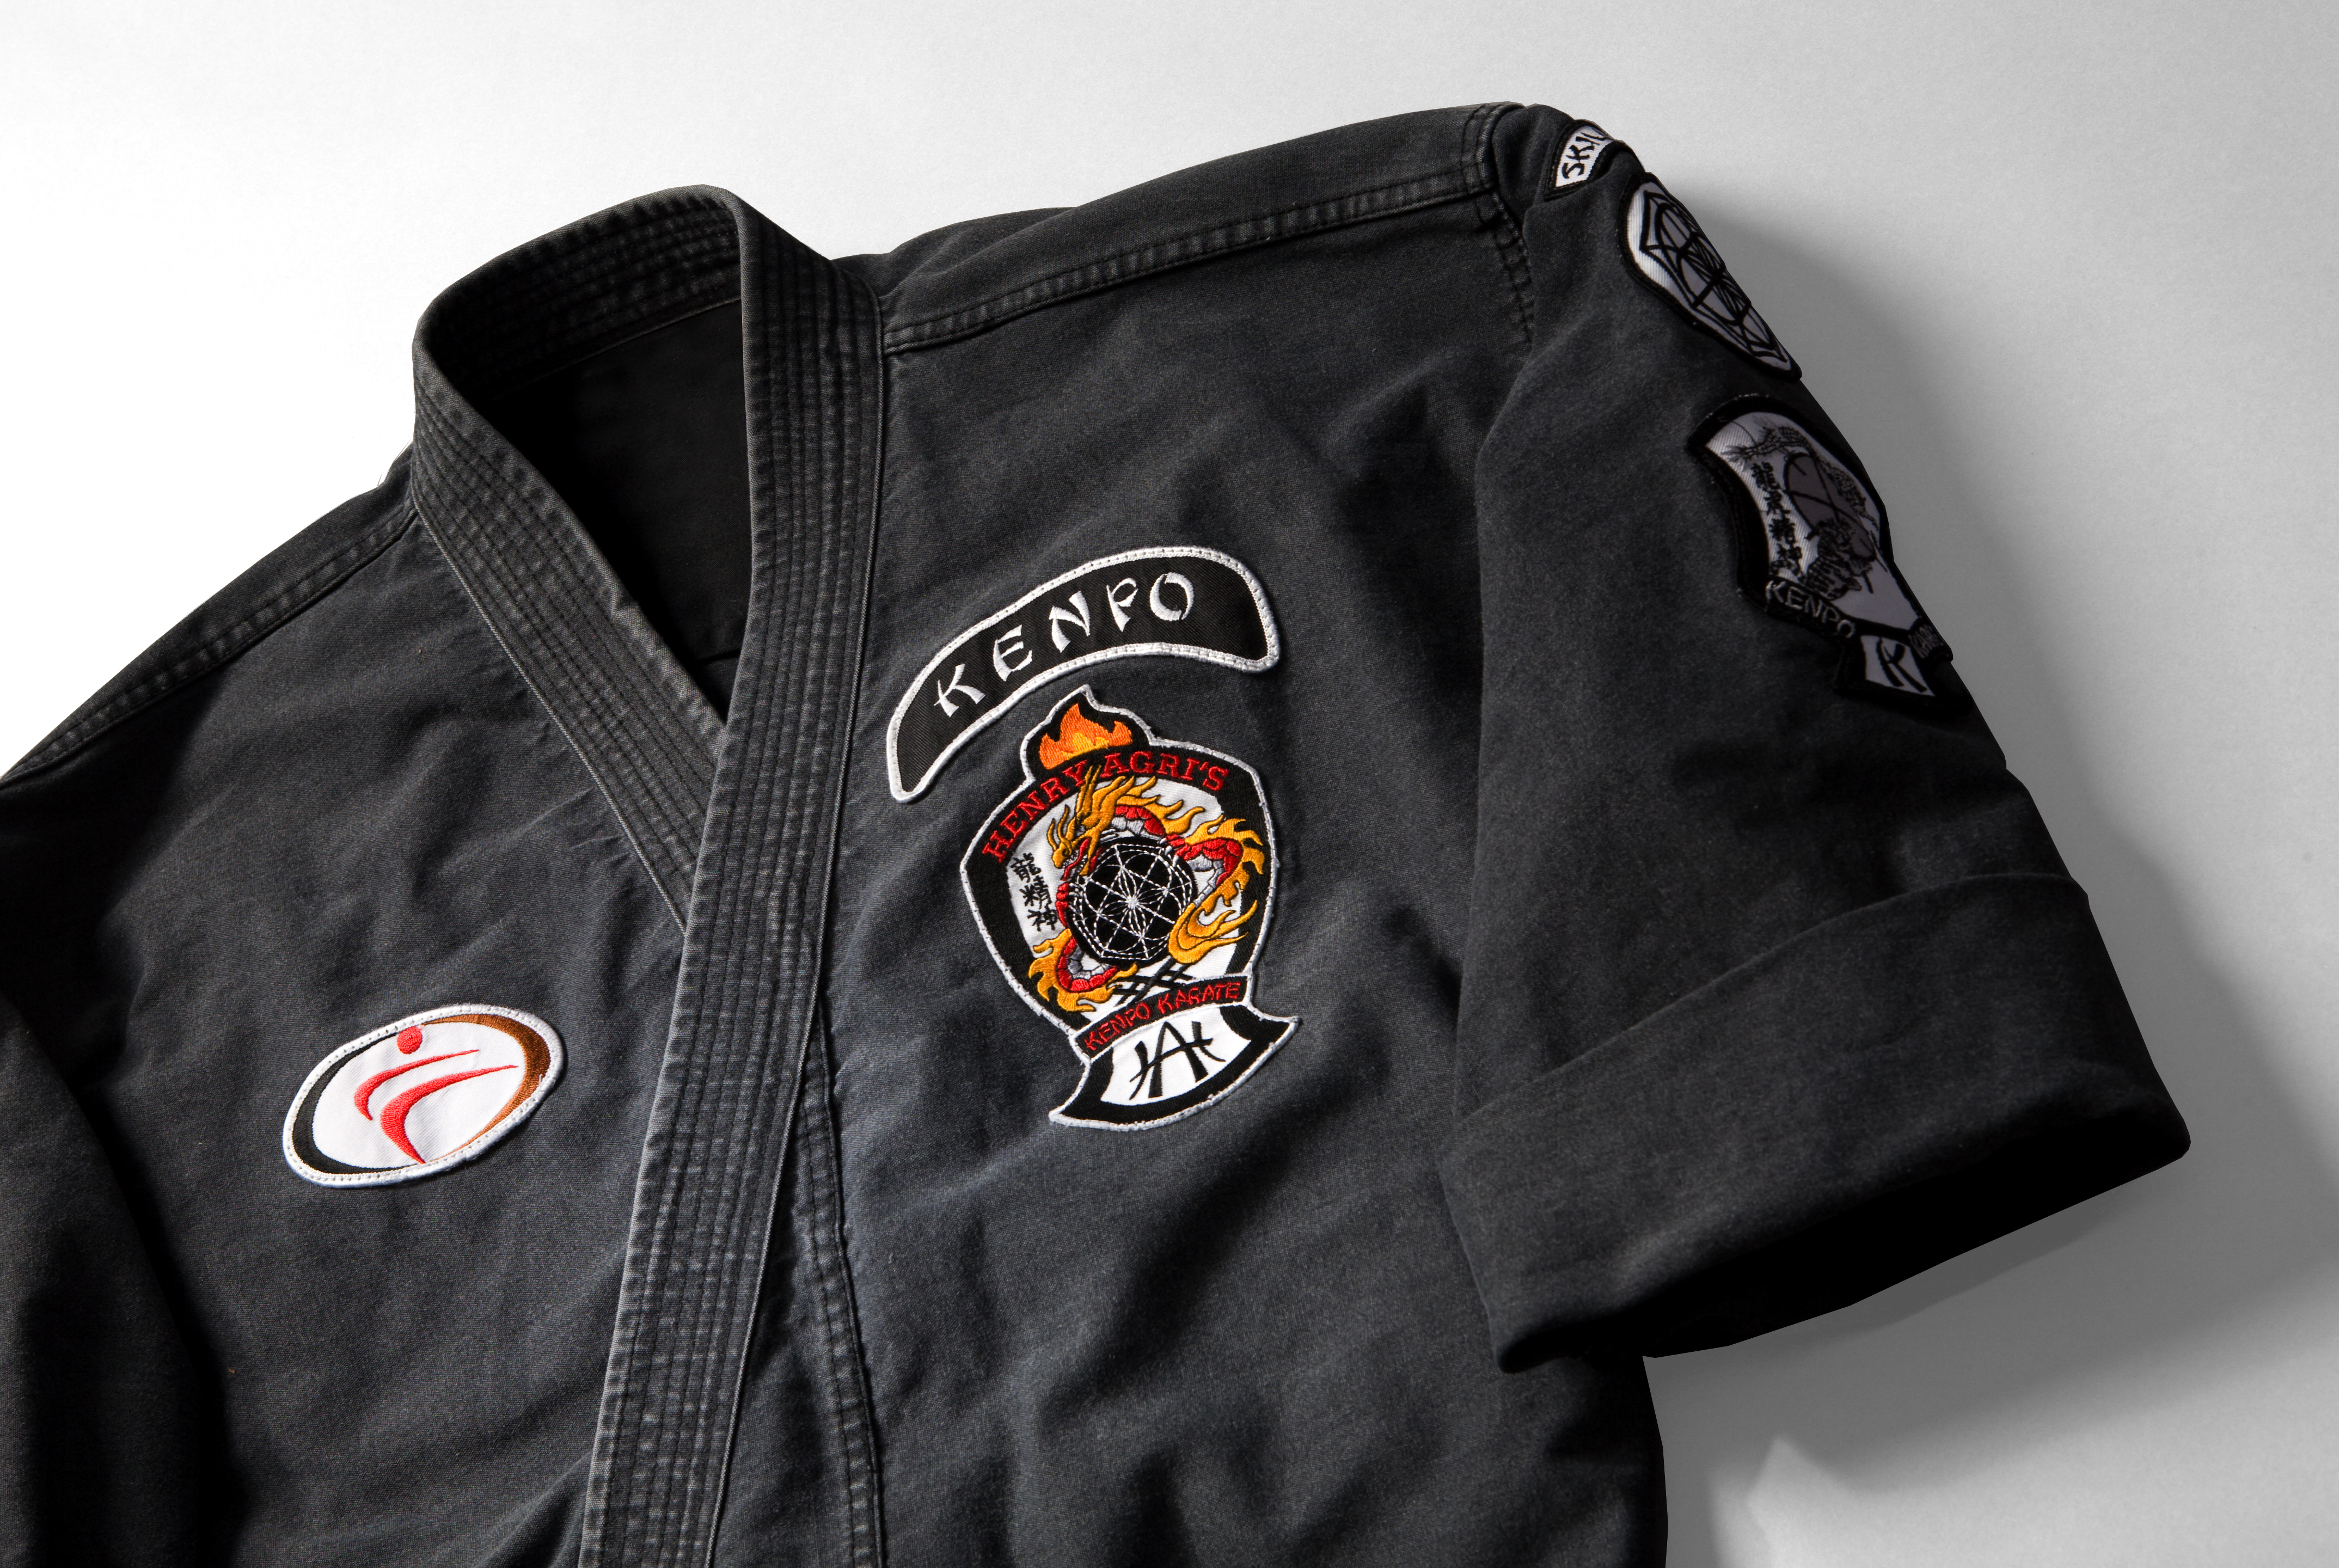 Kenpo Karate Uniform 121